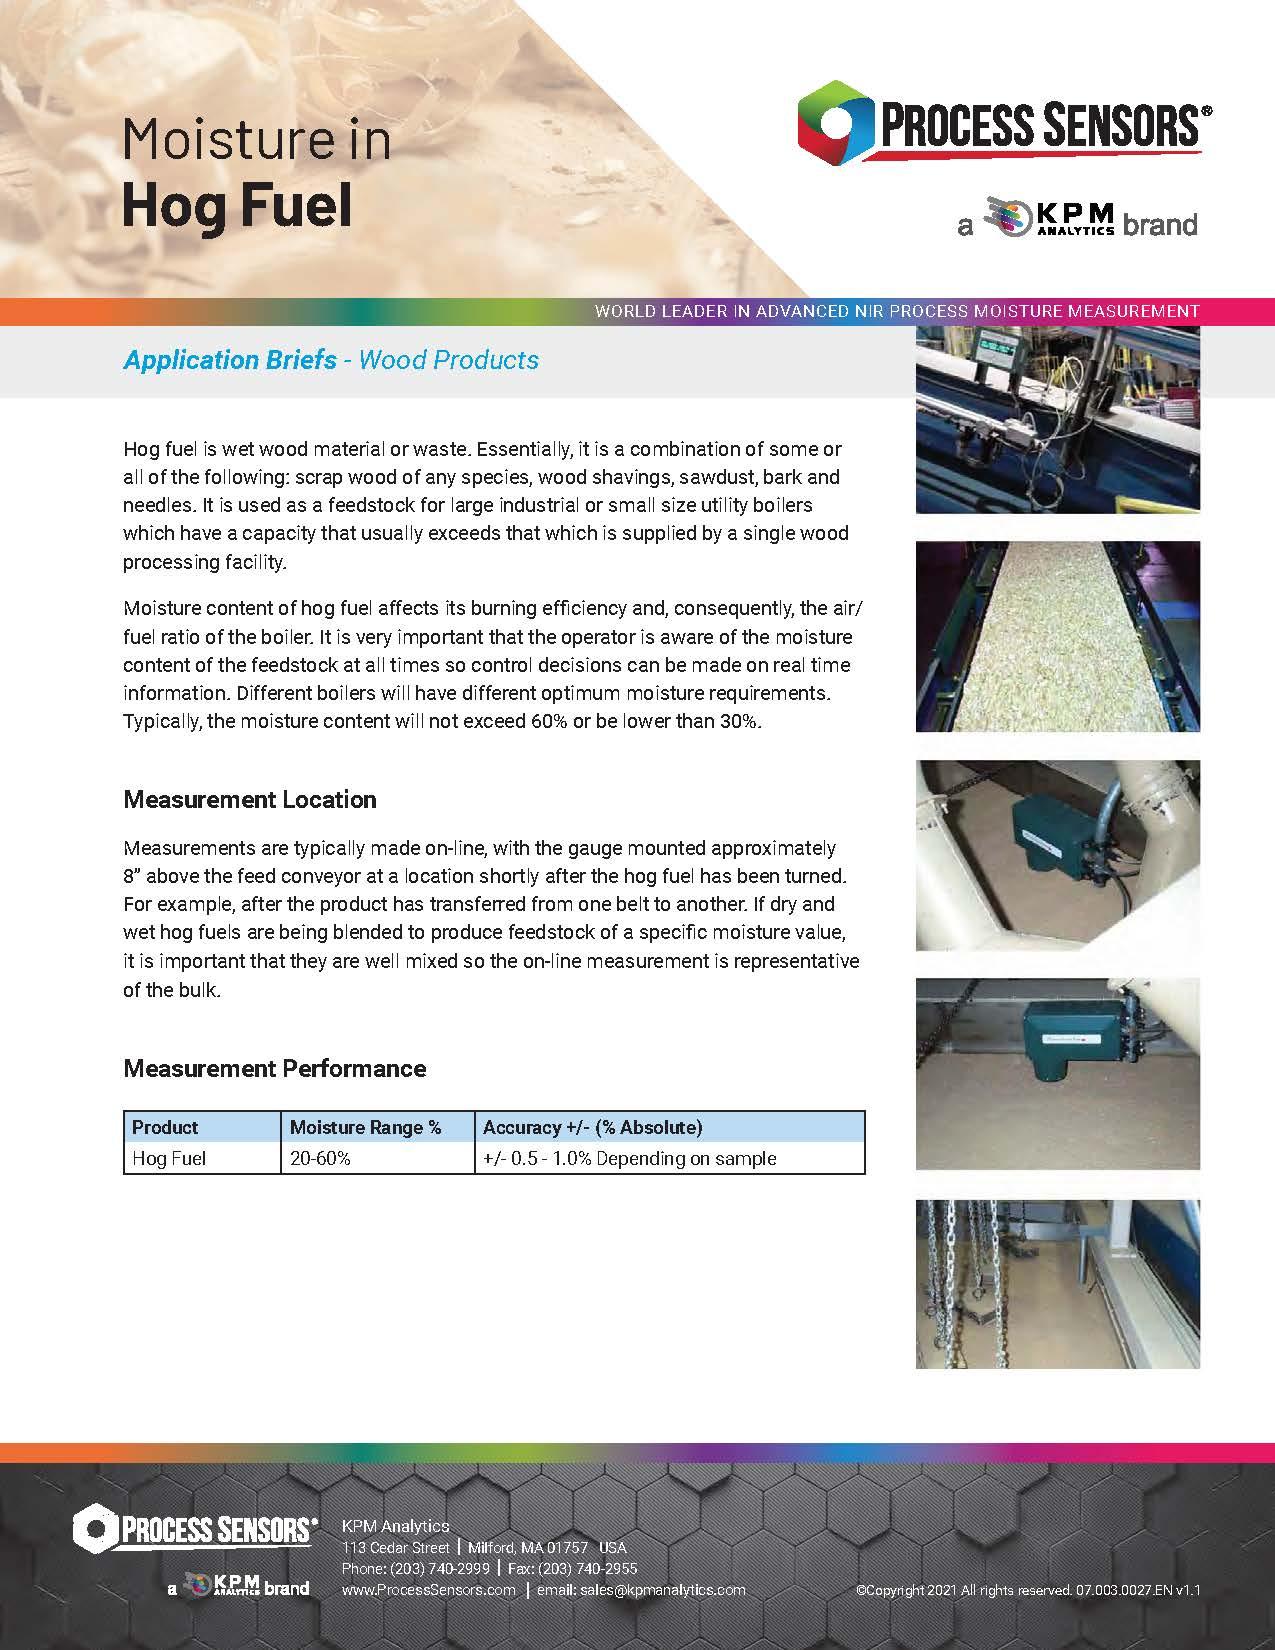 Moisture in Hog Fuel